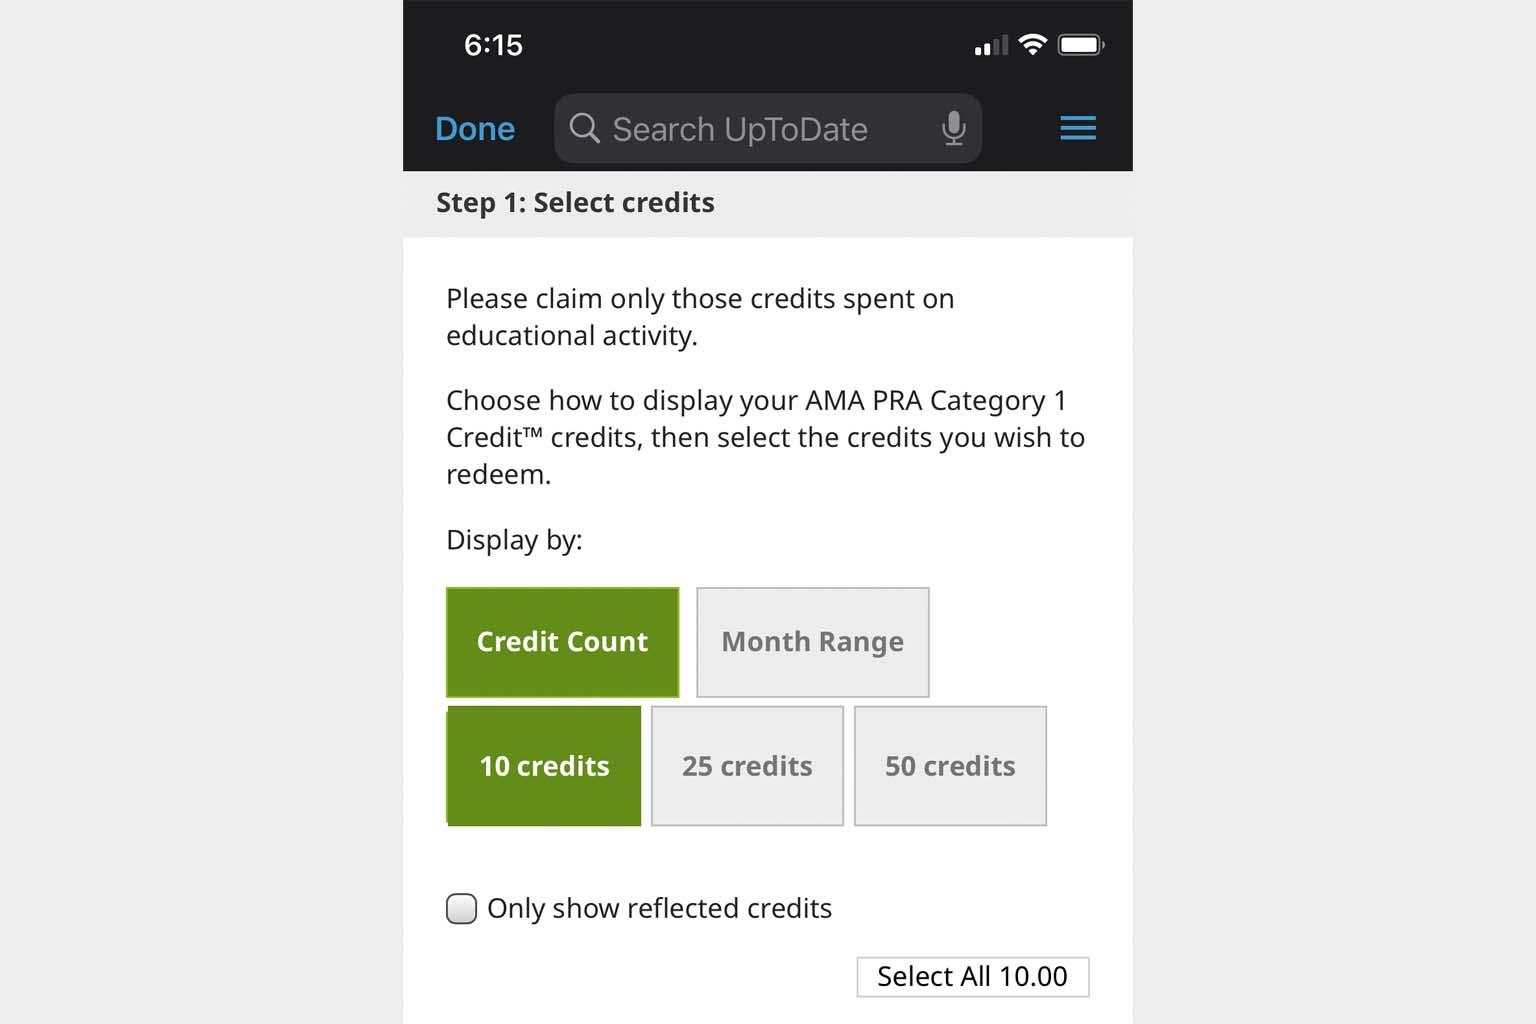 screenshot of CME redemption screen in UpToDate